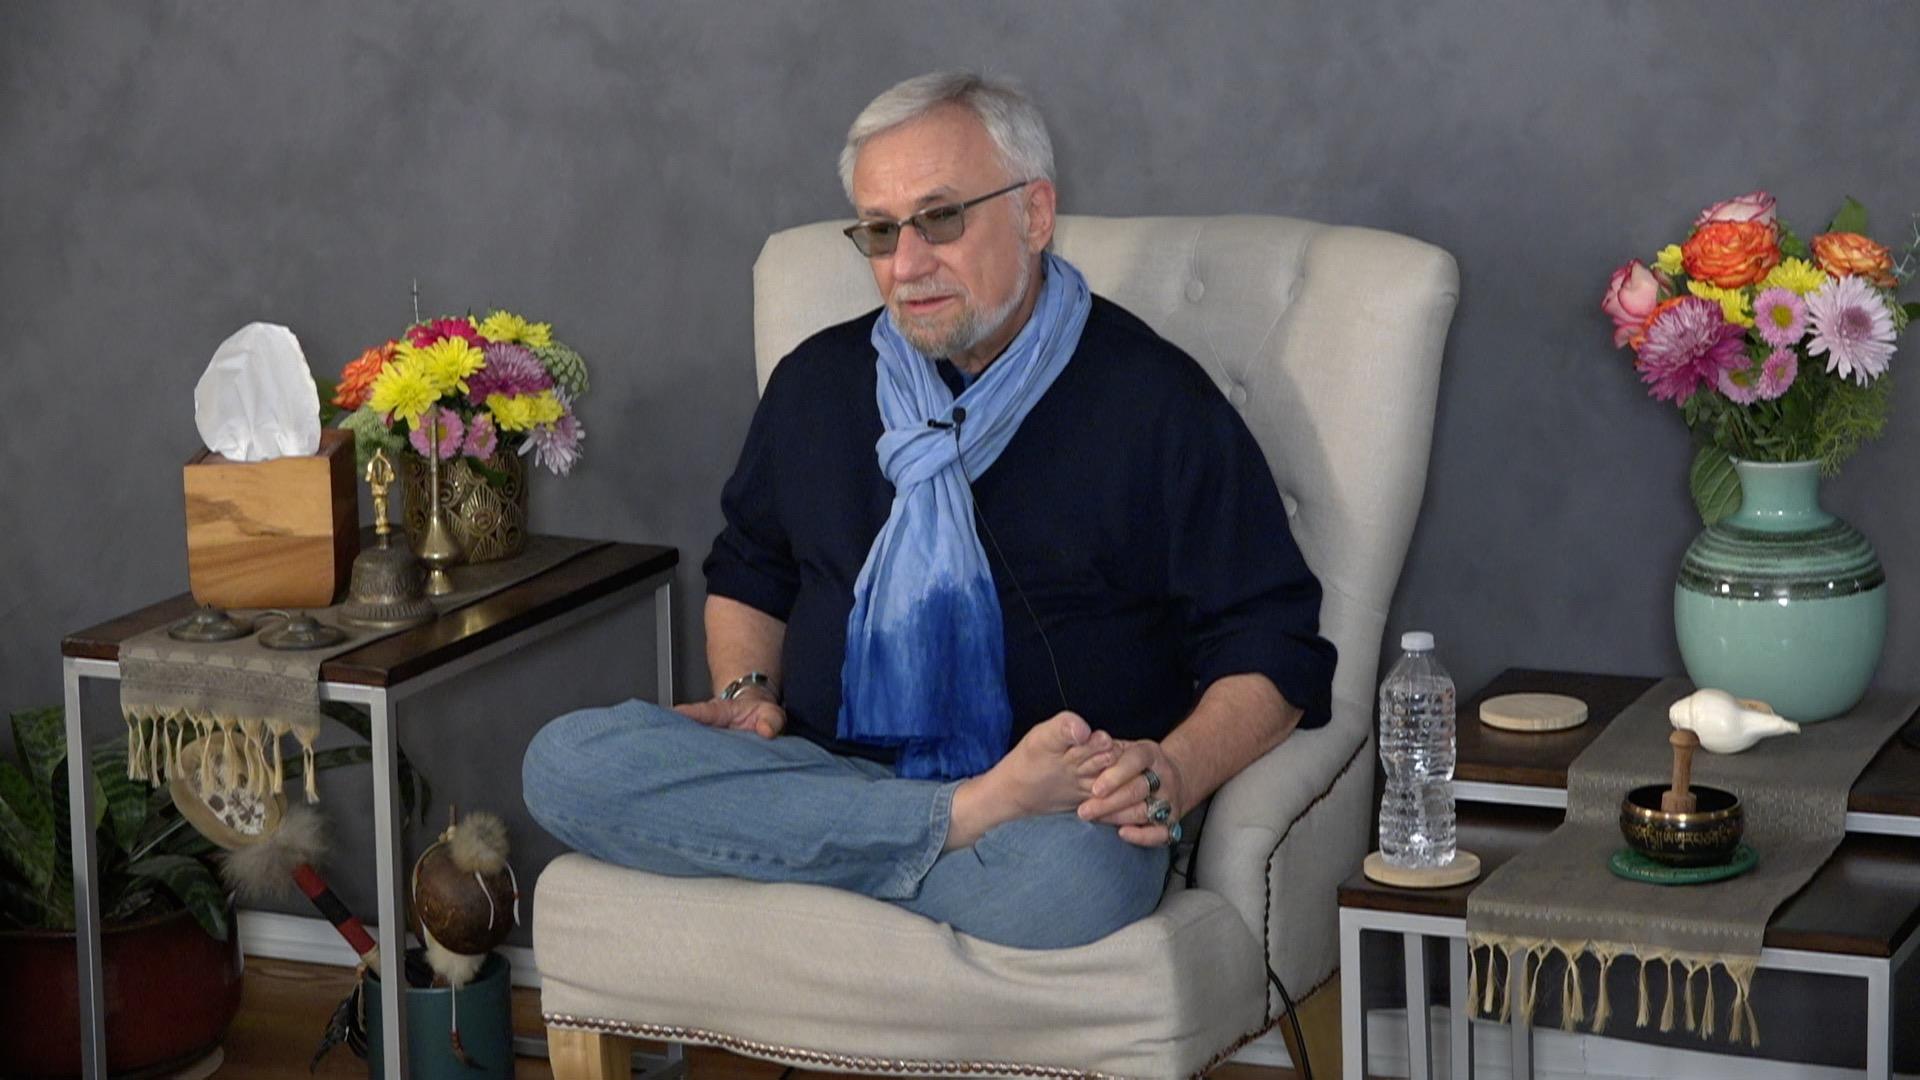 11-March-2019 Spiritual Discourse with Swami Premodaya 4.jpg